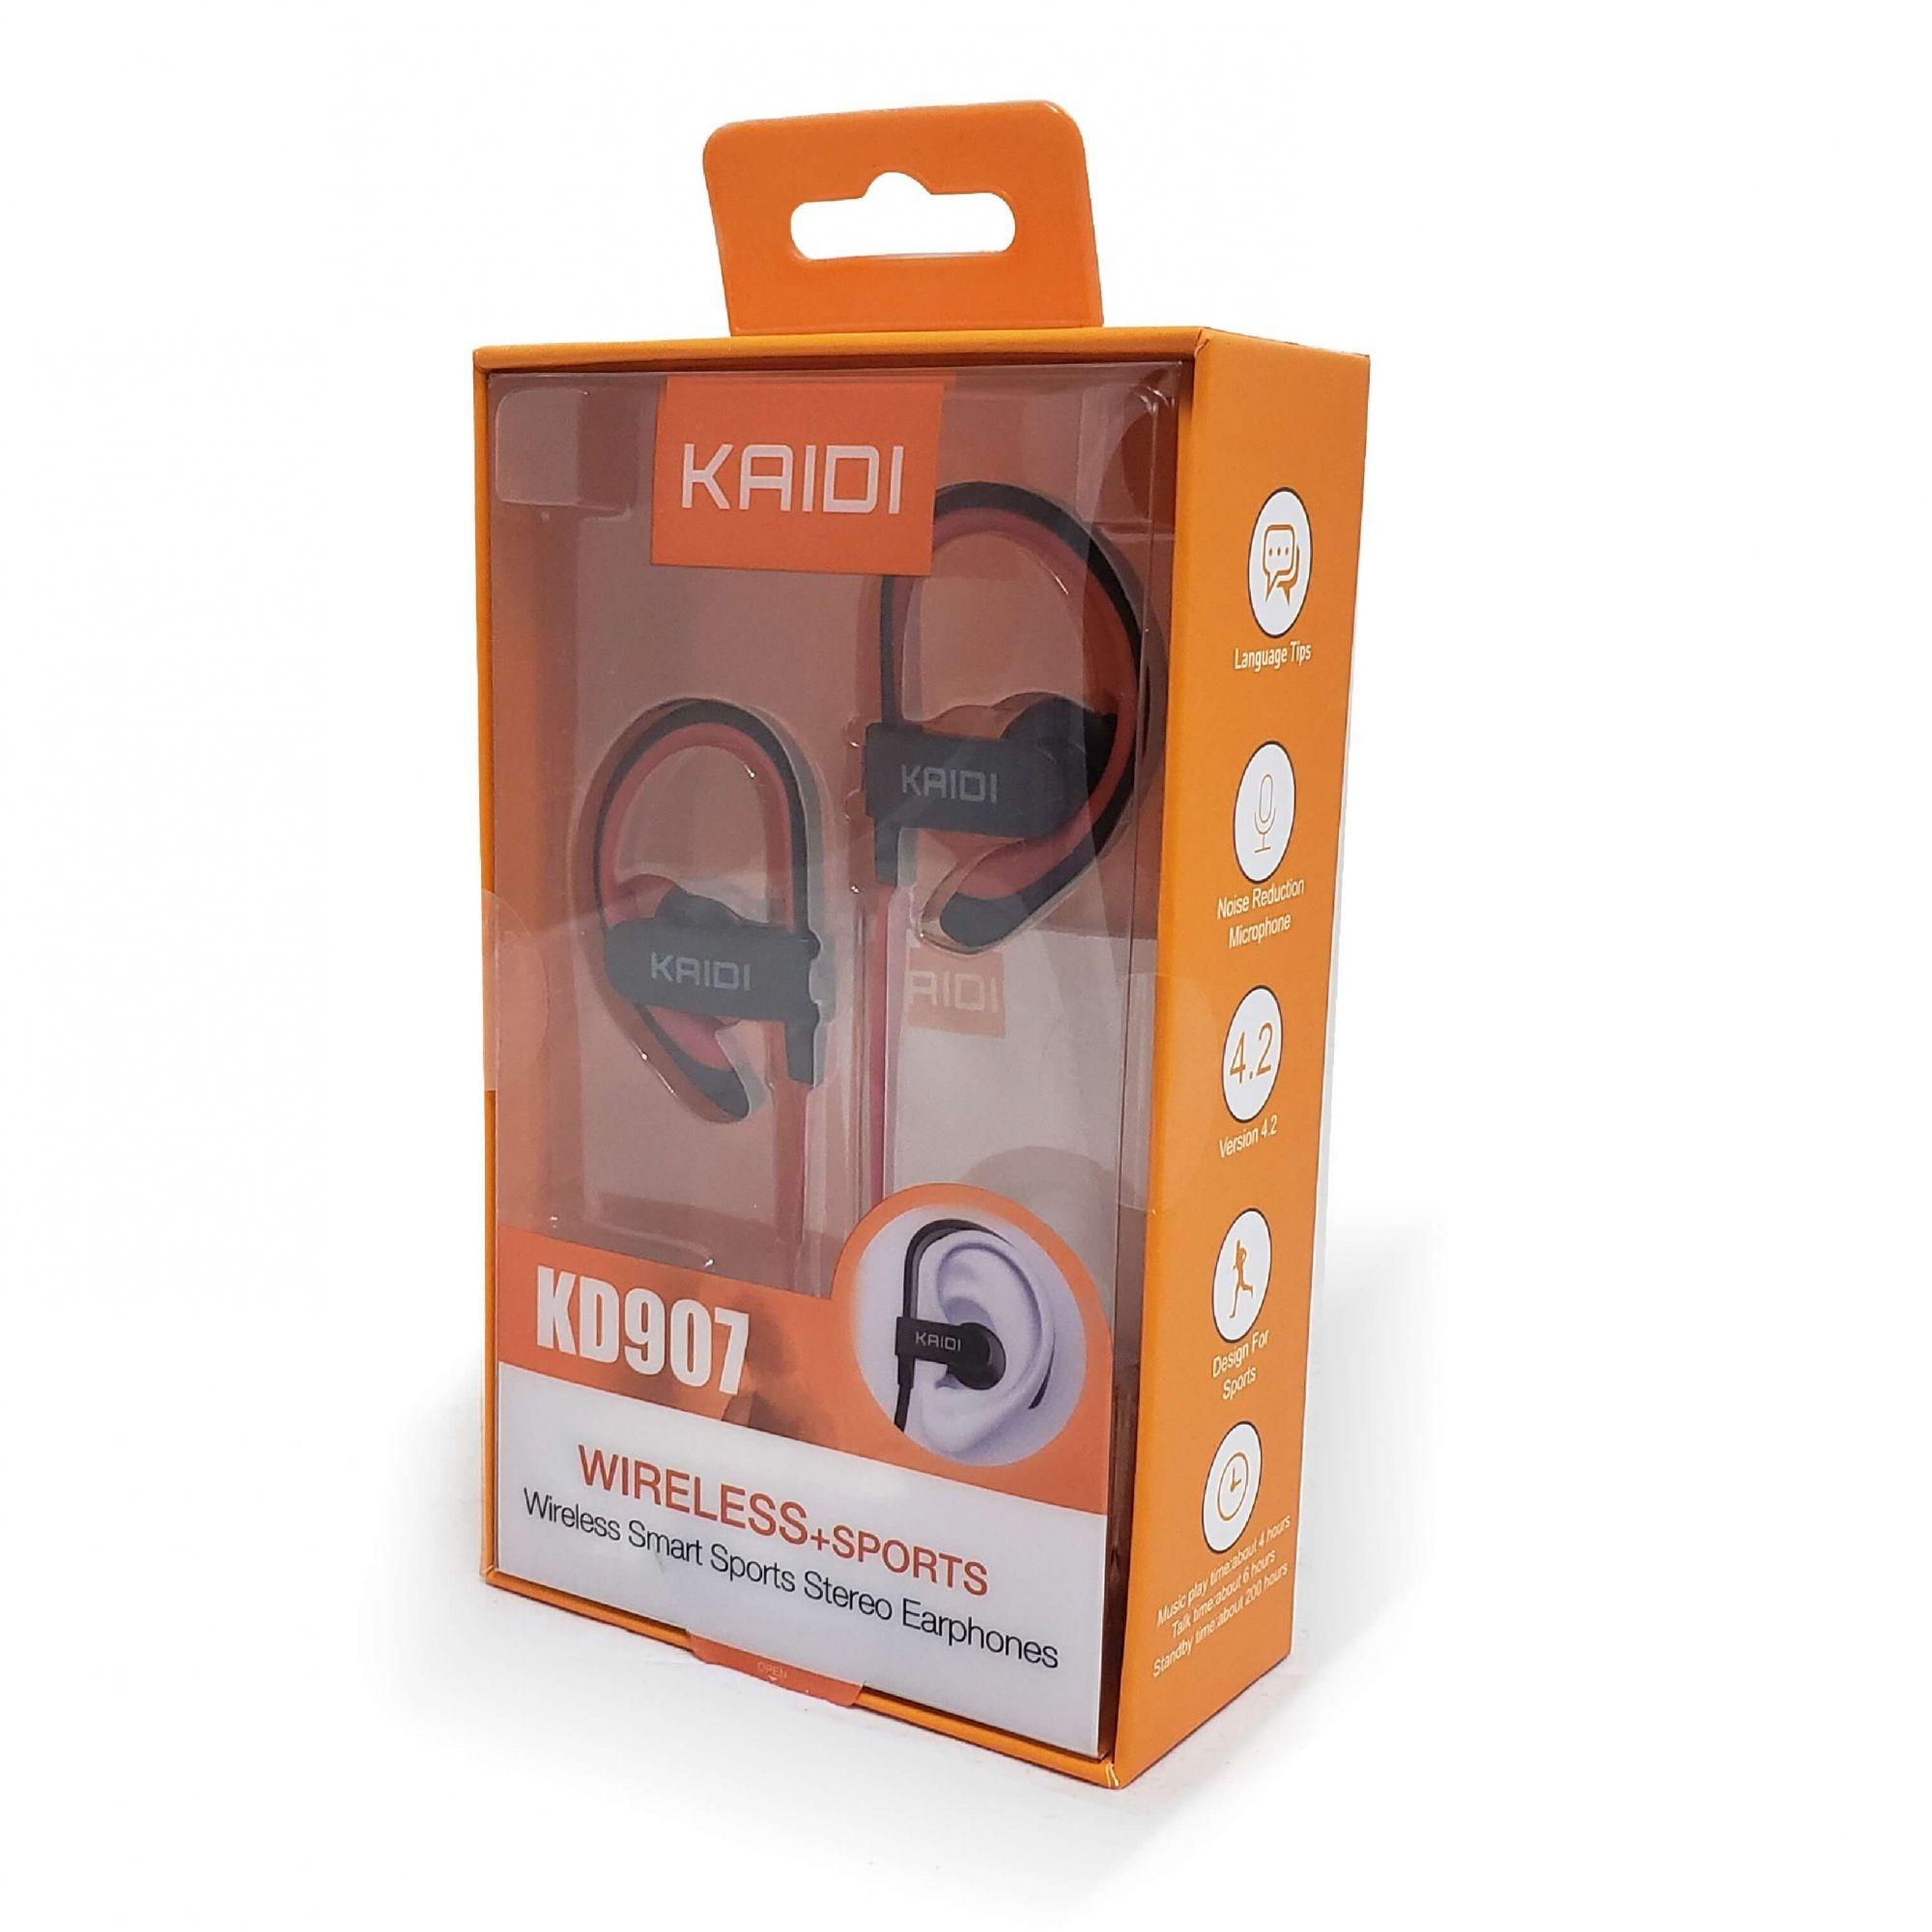 Fone Sem Fio Bluetooth Para Esportes e Corrida Kaidi KD 907